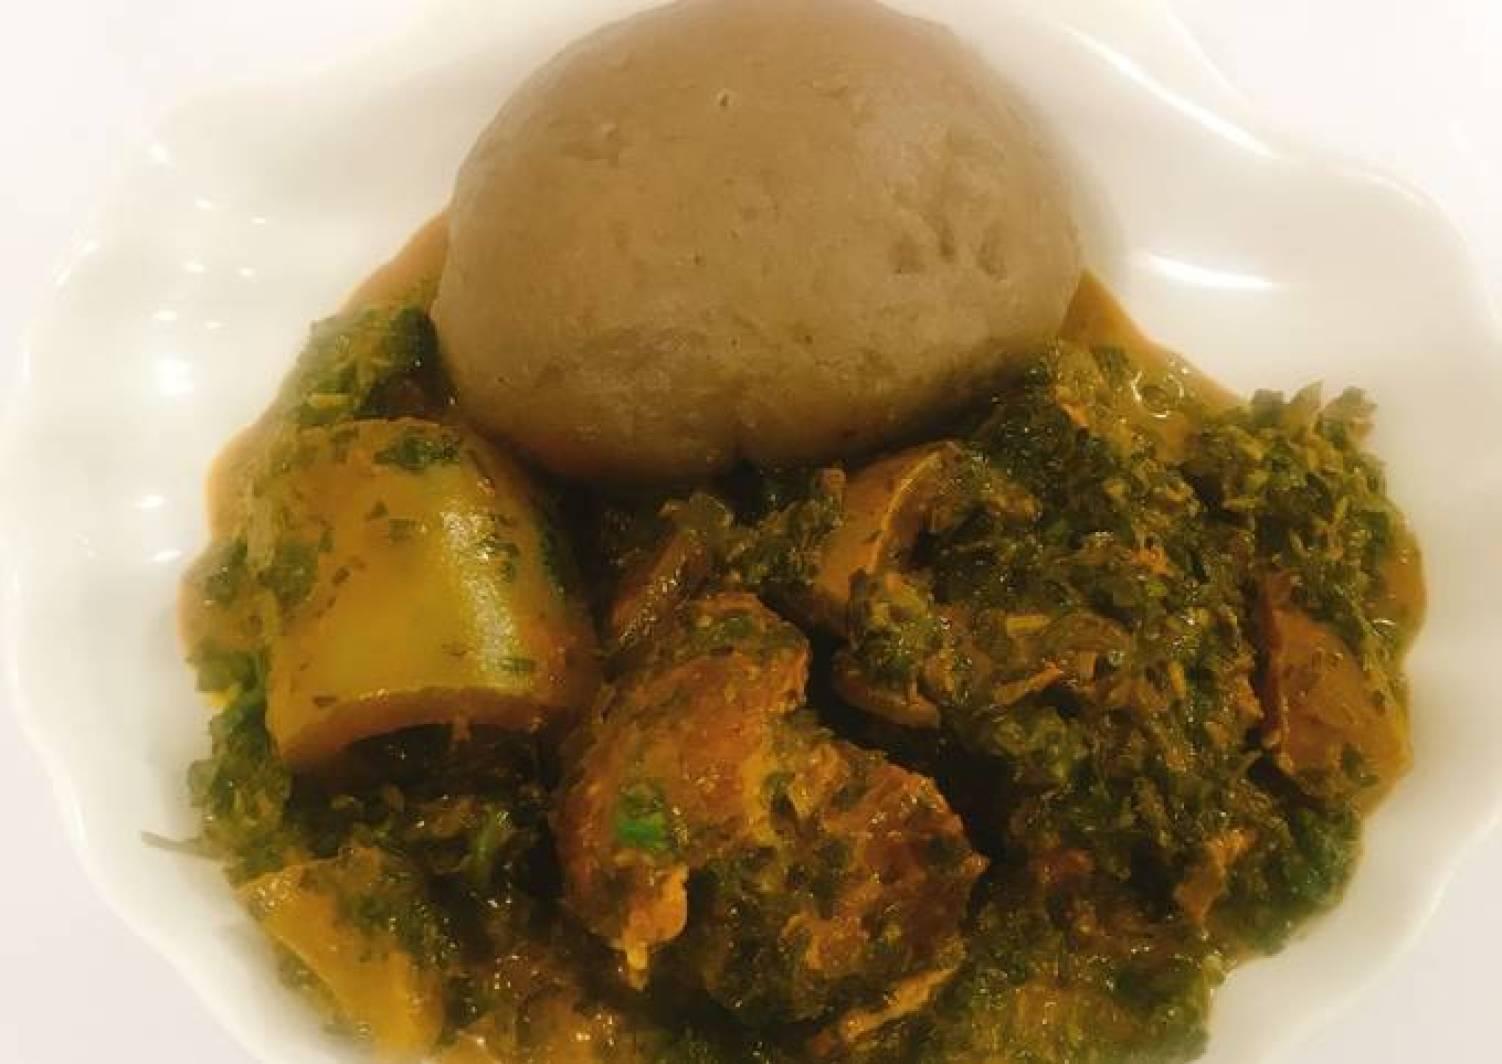 Vegetable soup and amala